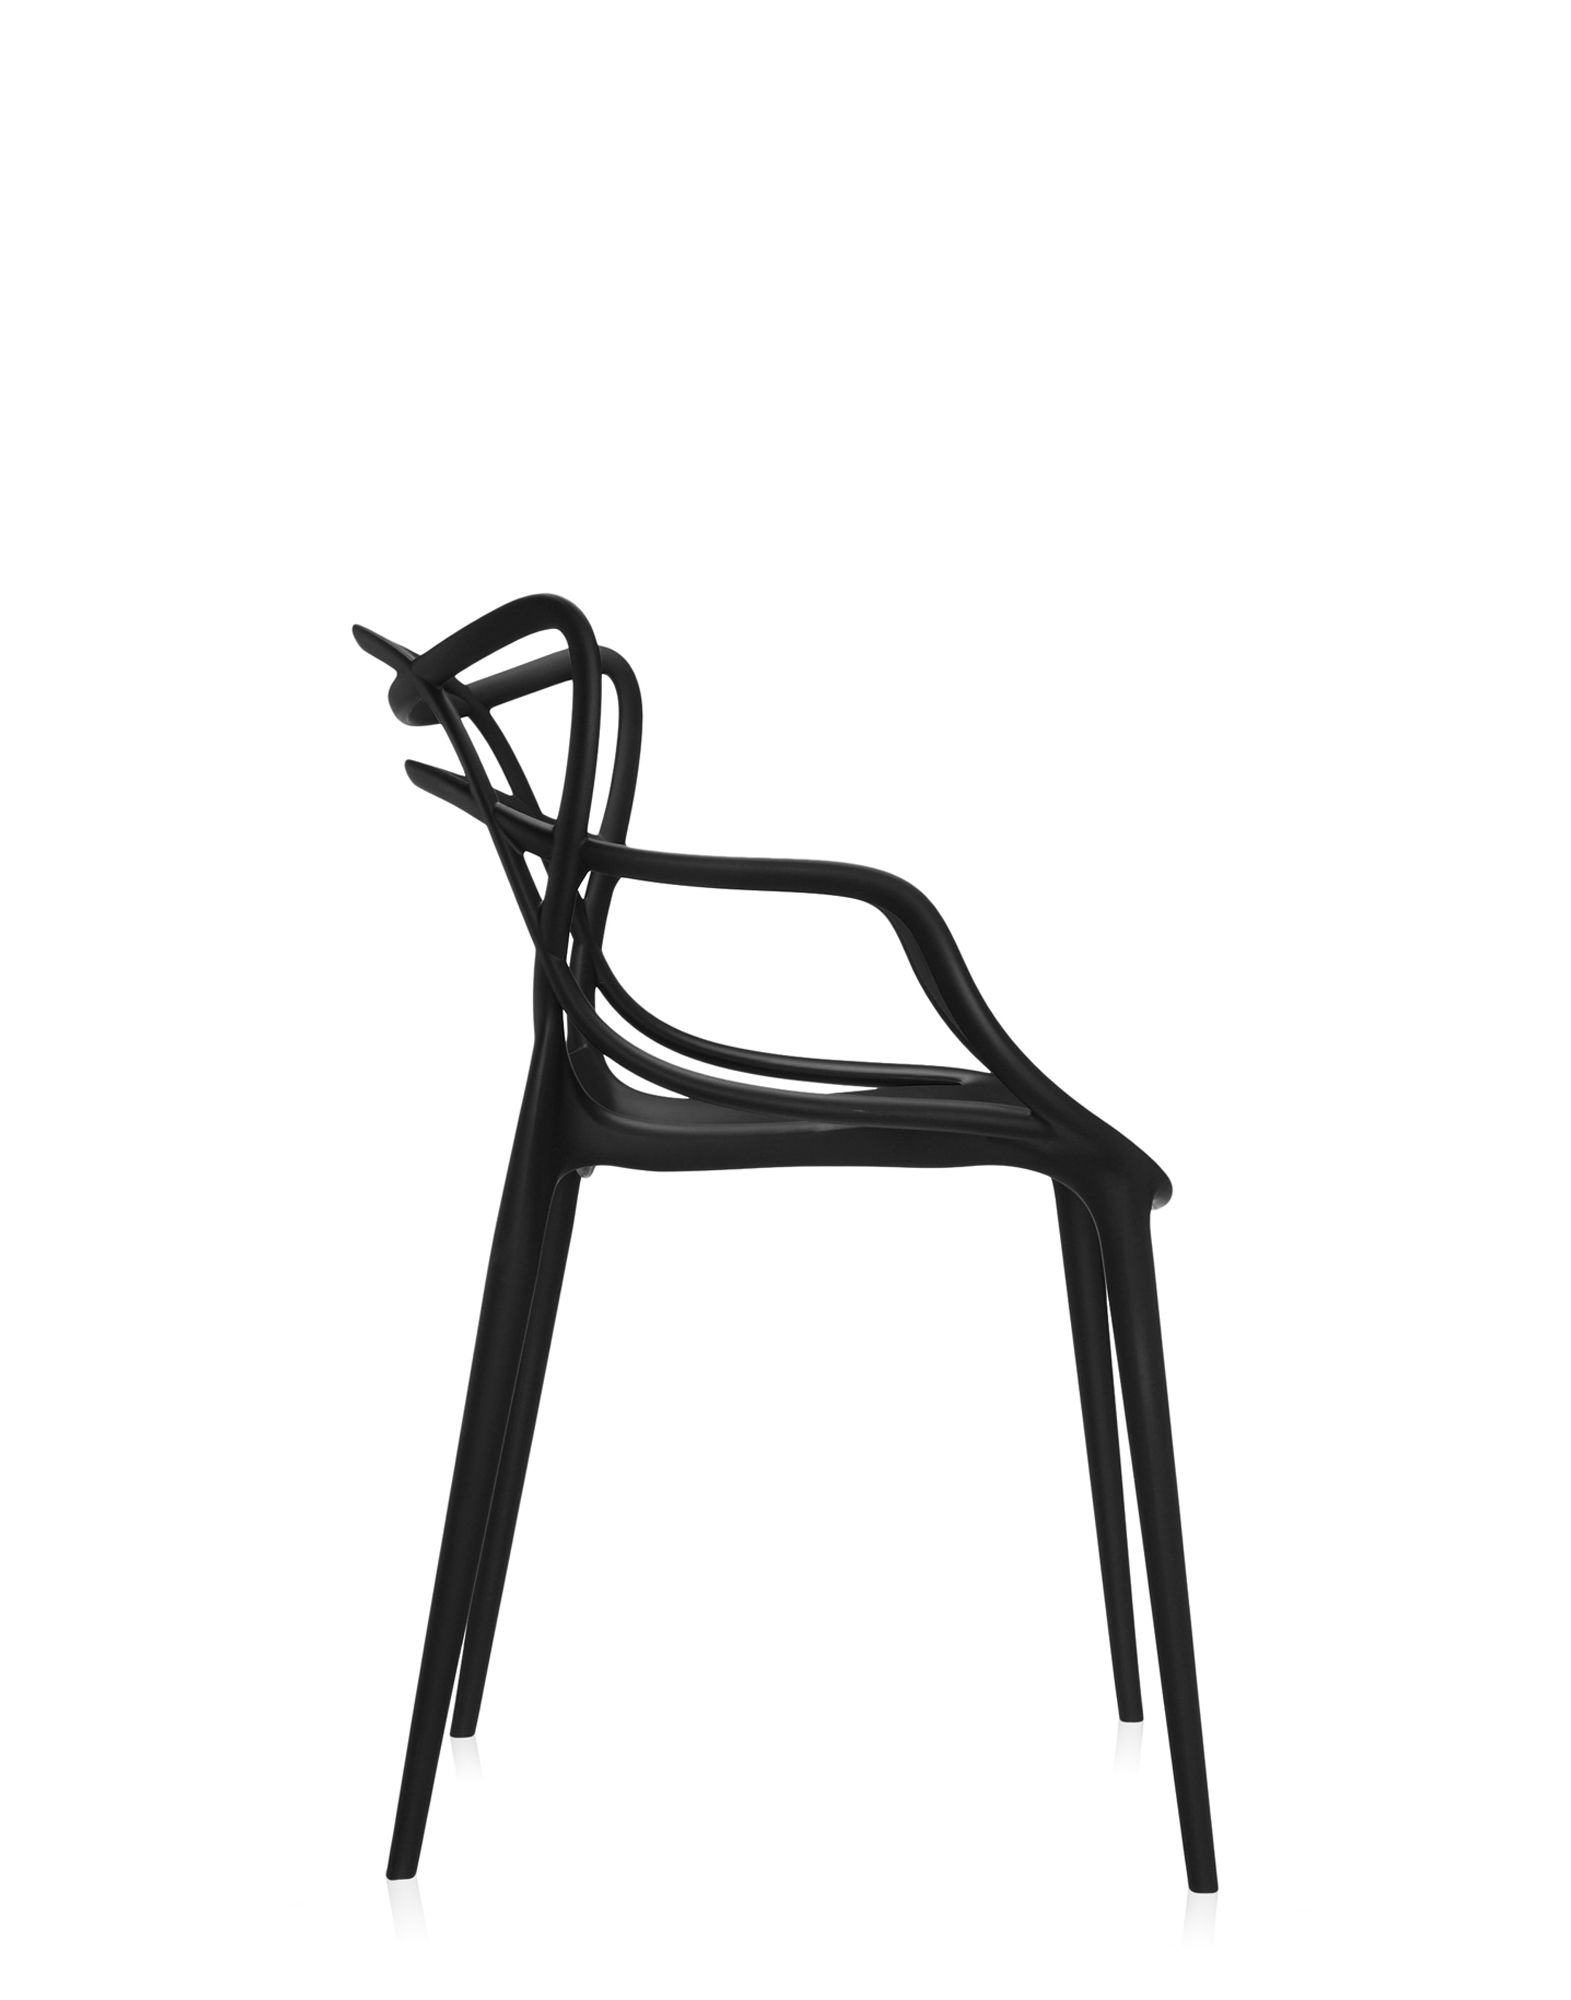 Kartell sedia masters nera sedie design newformsdesign for Sedia design nera